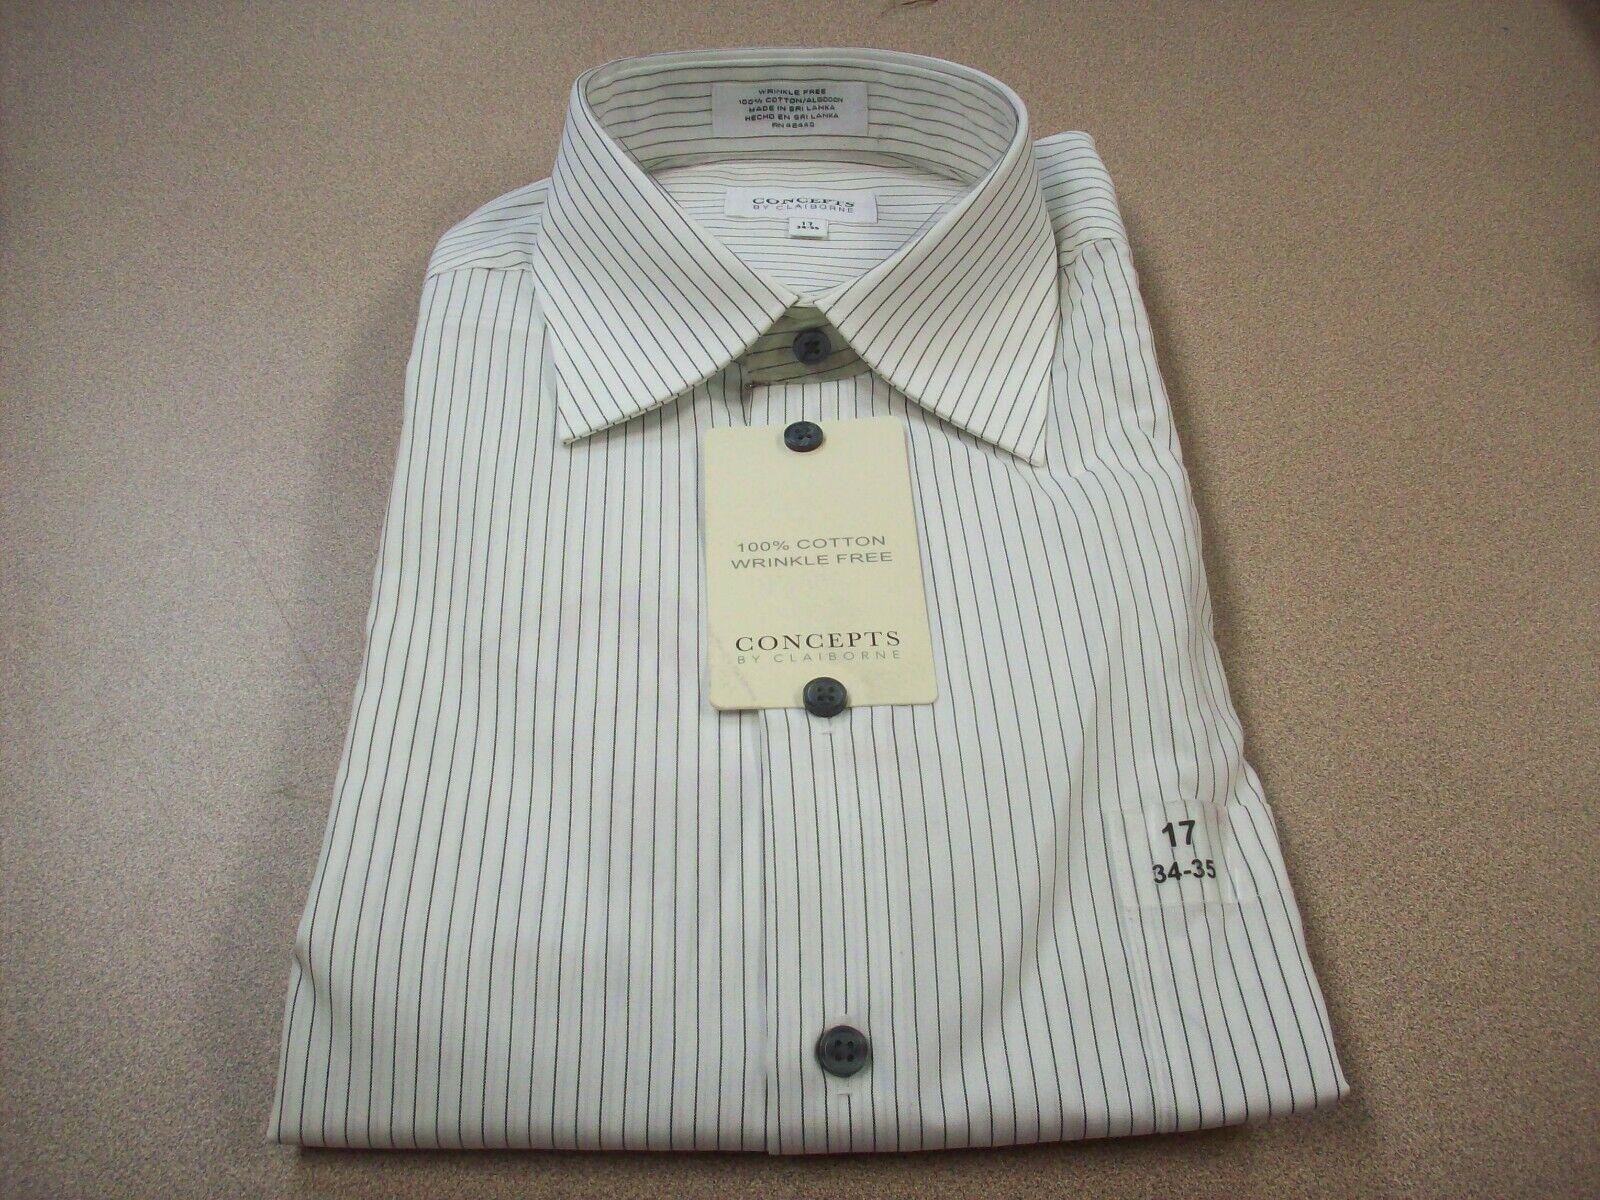 Claiborne Men's Wrinkle Free Dress Shirt White bluee Striped Size 17 34-35